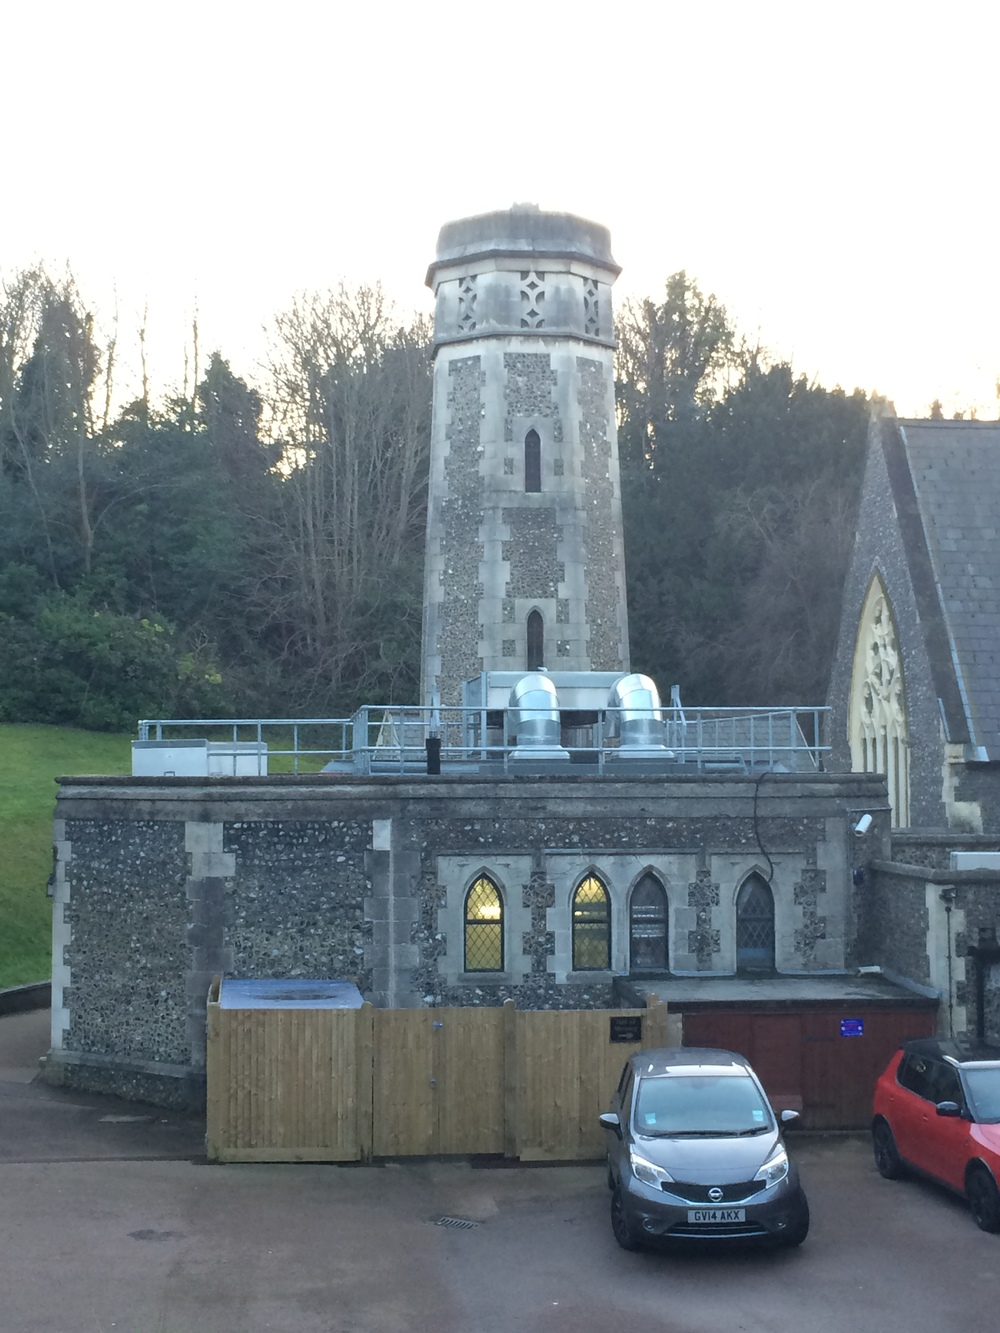 Aleister-Crowley-Crematorium-Brighton-Woodvale-Cemetery-jessewaugh.com-13.jpg